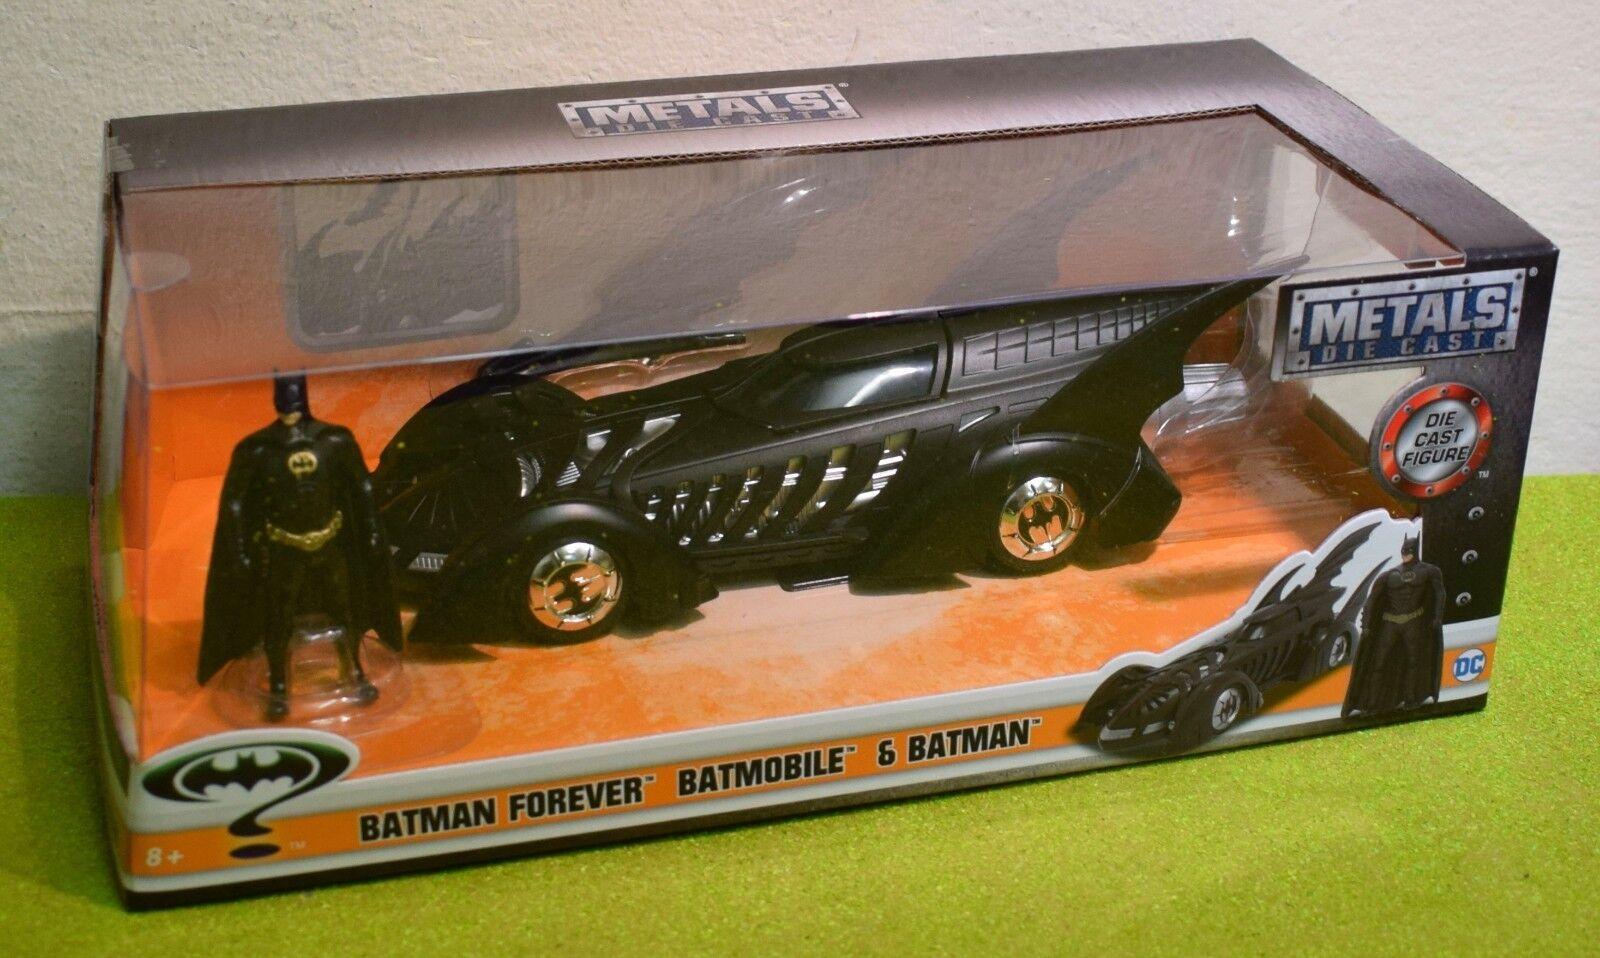 DIE-CAST JADA 1 24 SCALE BATMAN FOREVER BATMOBILE & BATMAN FIGURE